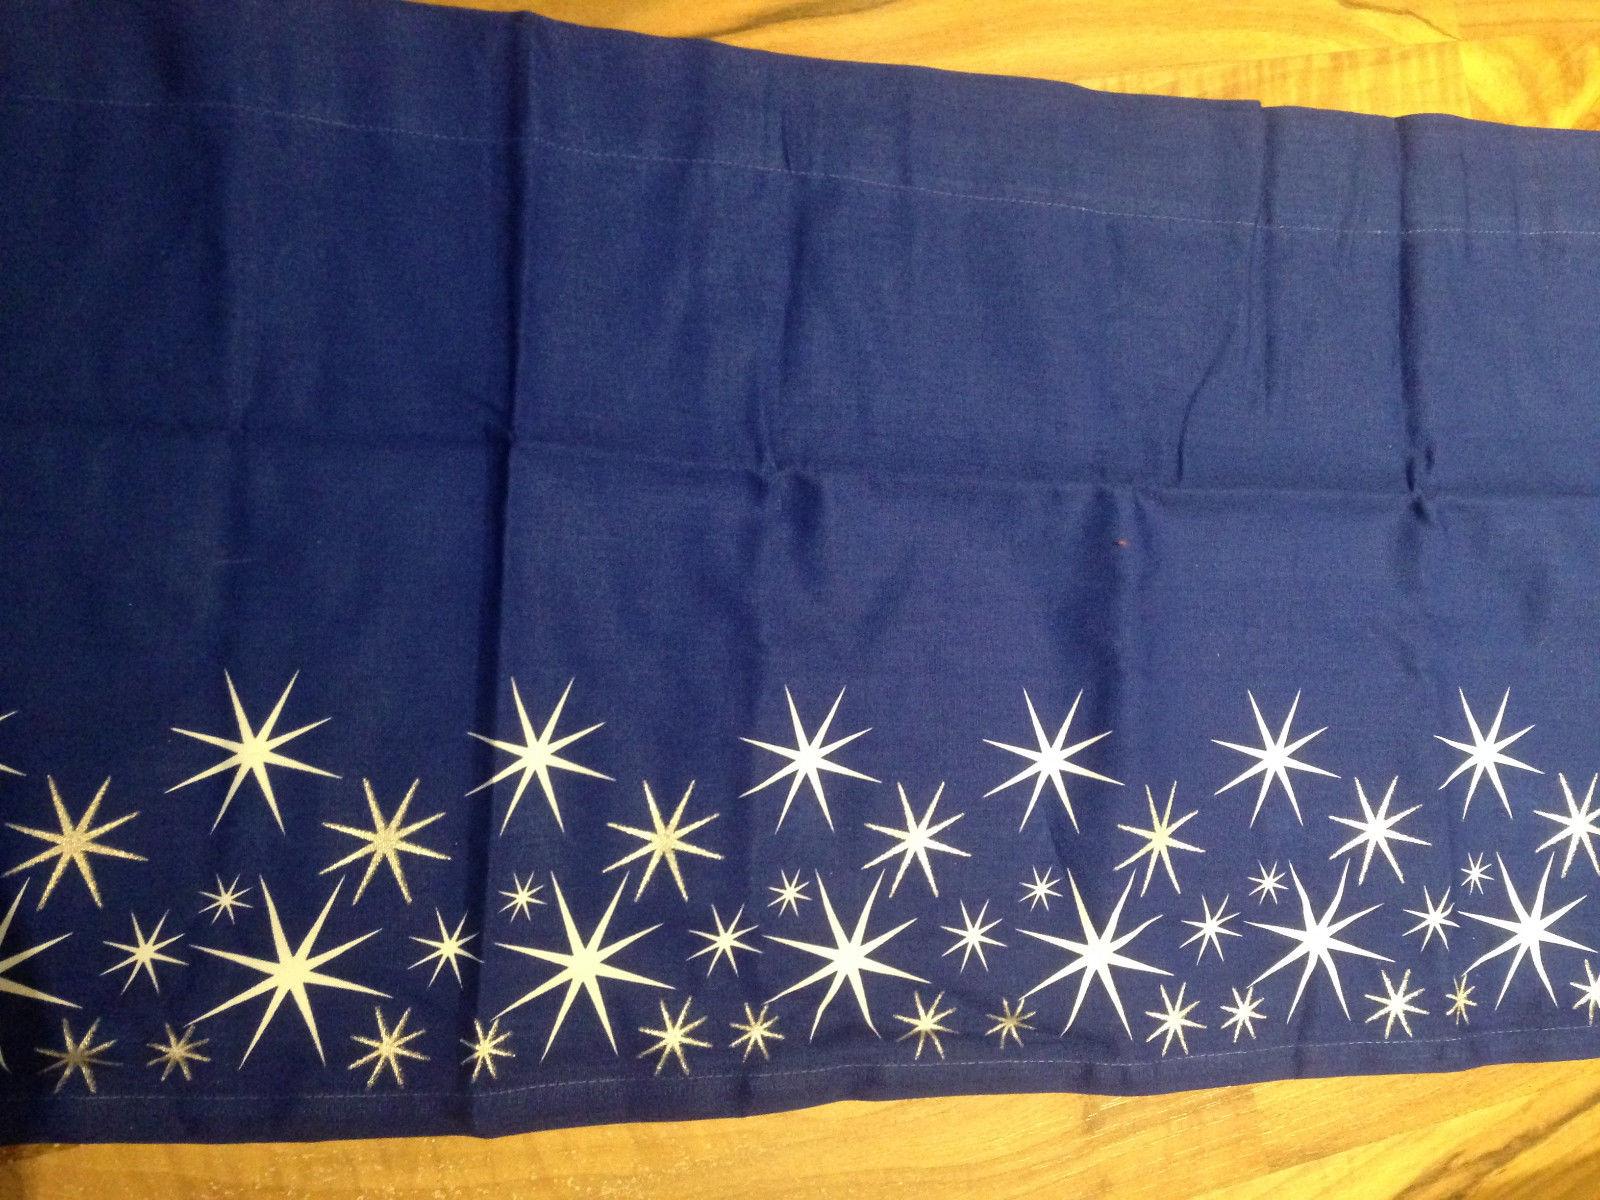 Ikea gardine scheibengardine store vorhang for Scheibengardinen ikea